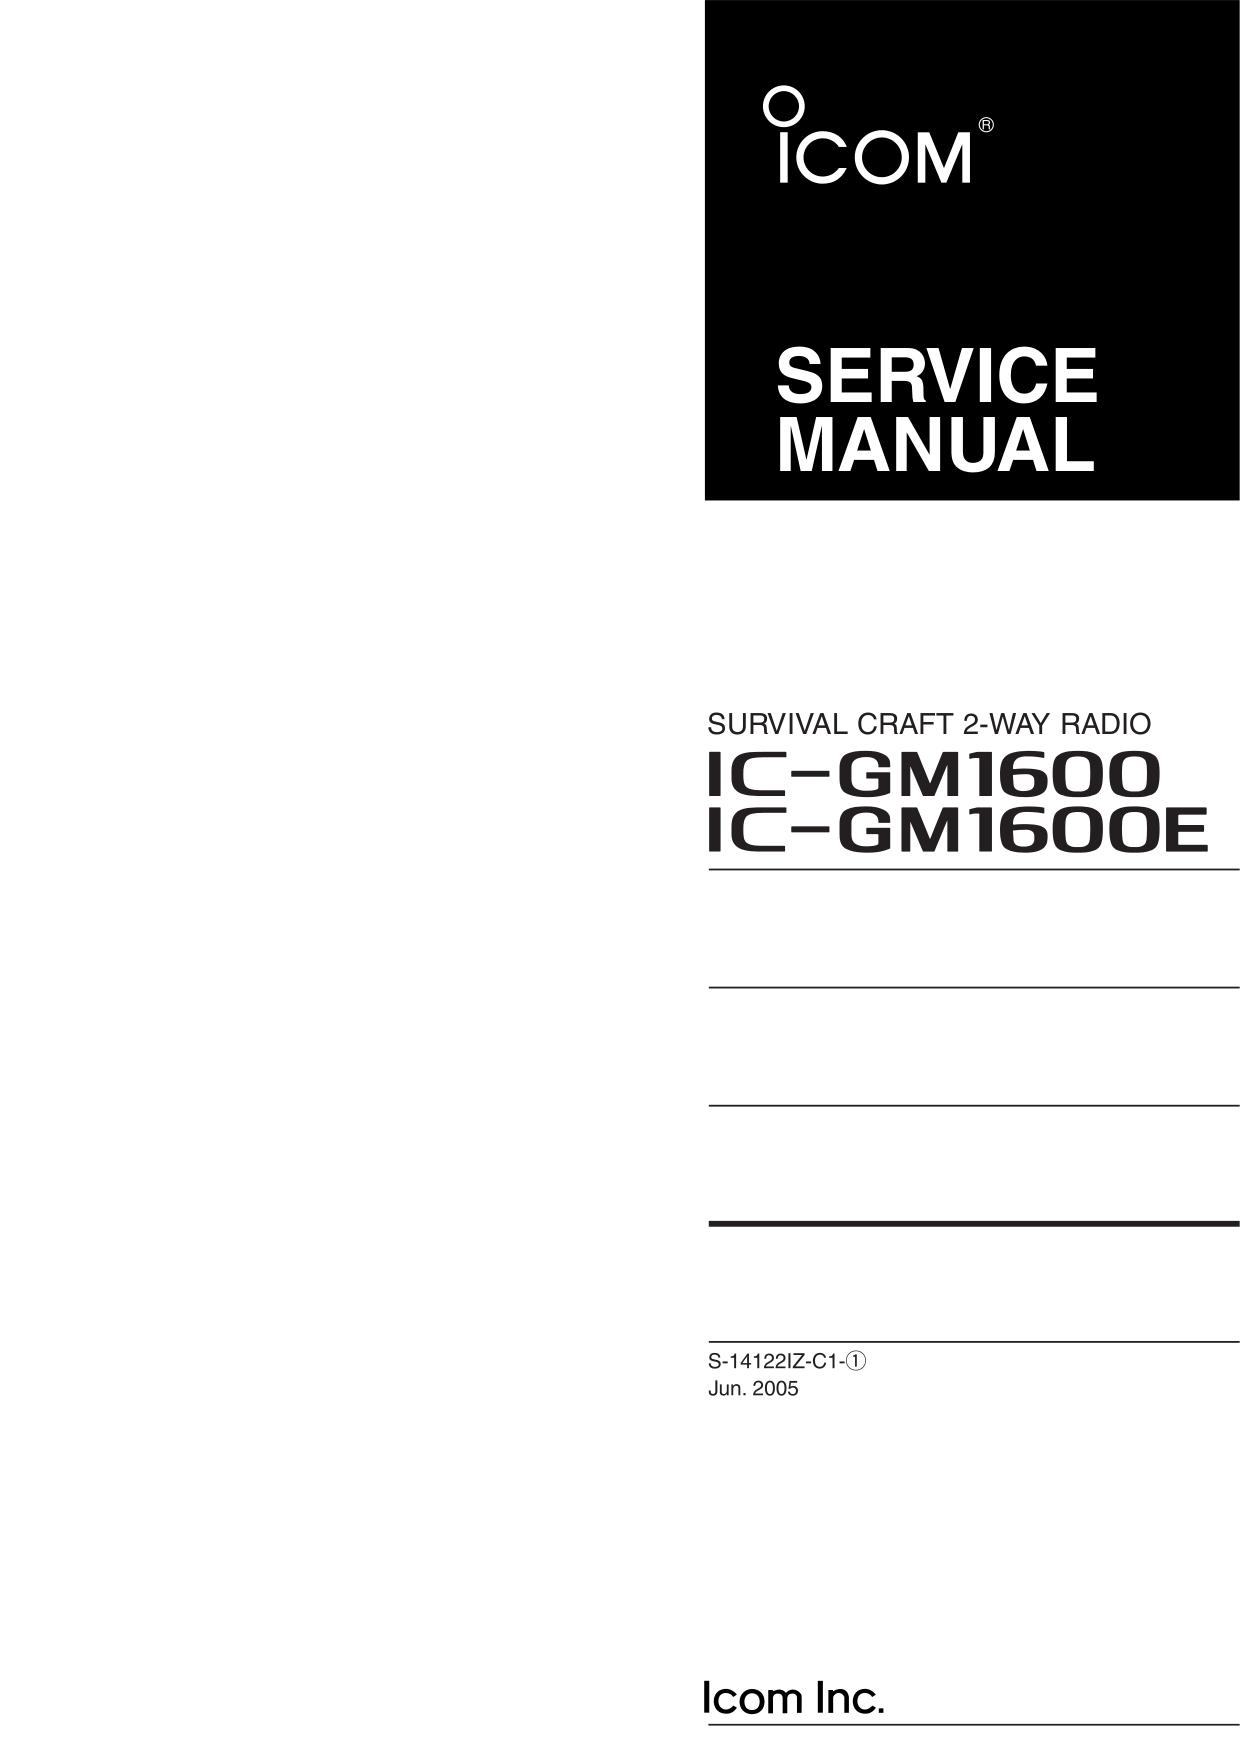 Icom A4 Manual